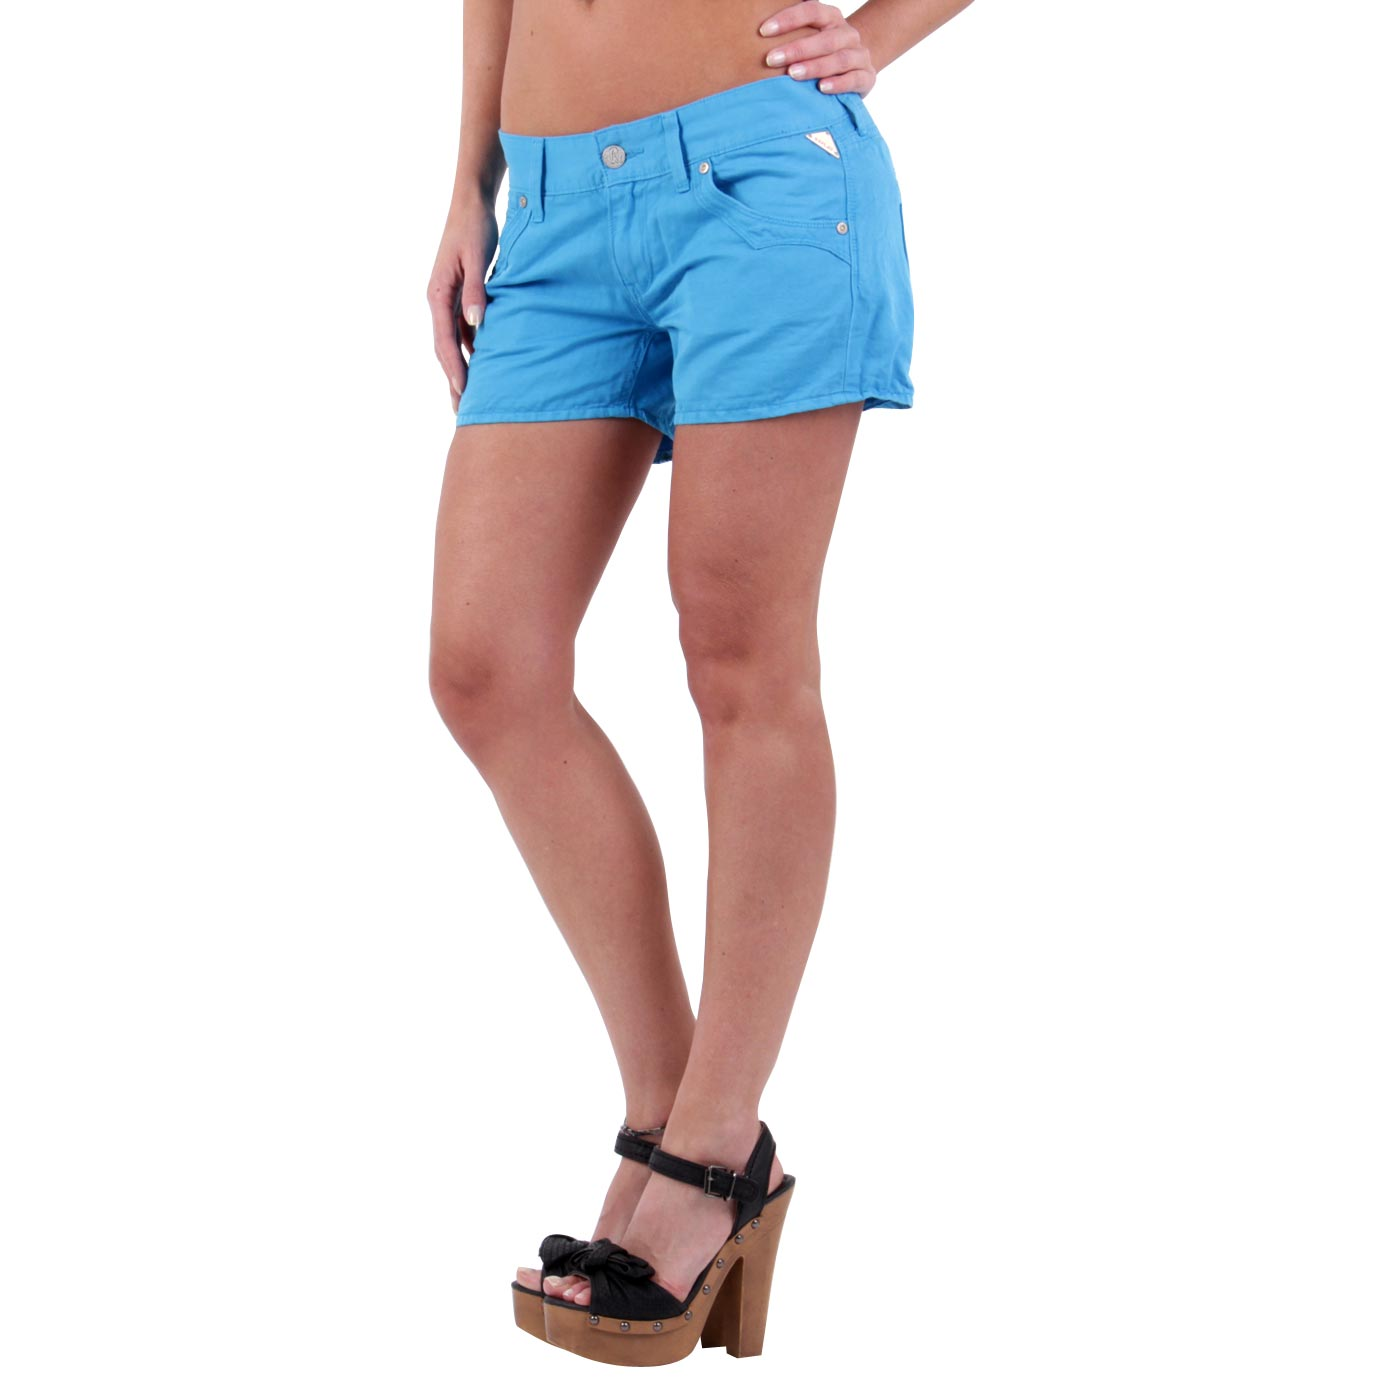 replay damen sommer leinen shorts kurze hose blue wv632 balingen. Black Bedroom Furniture Sets. Home Design Ideas